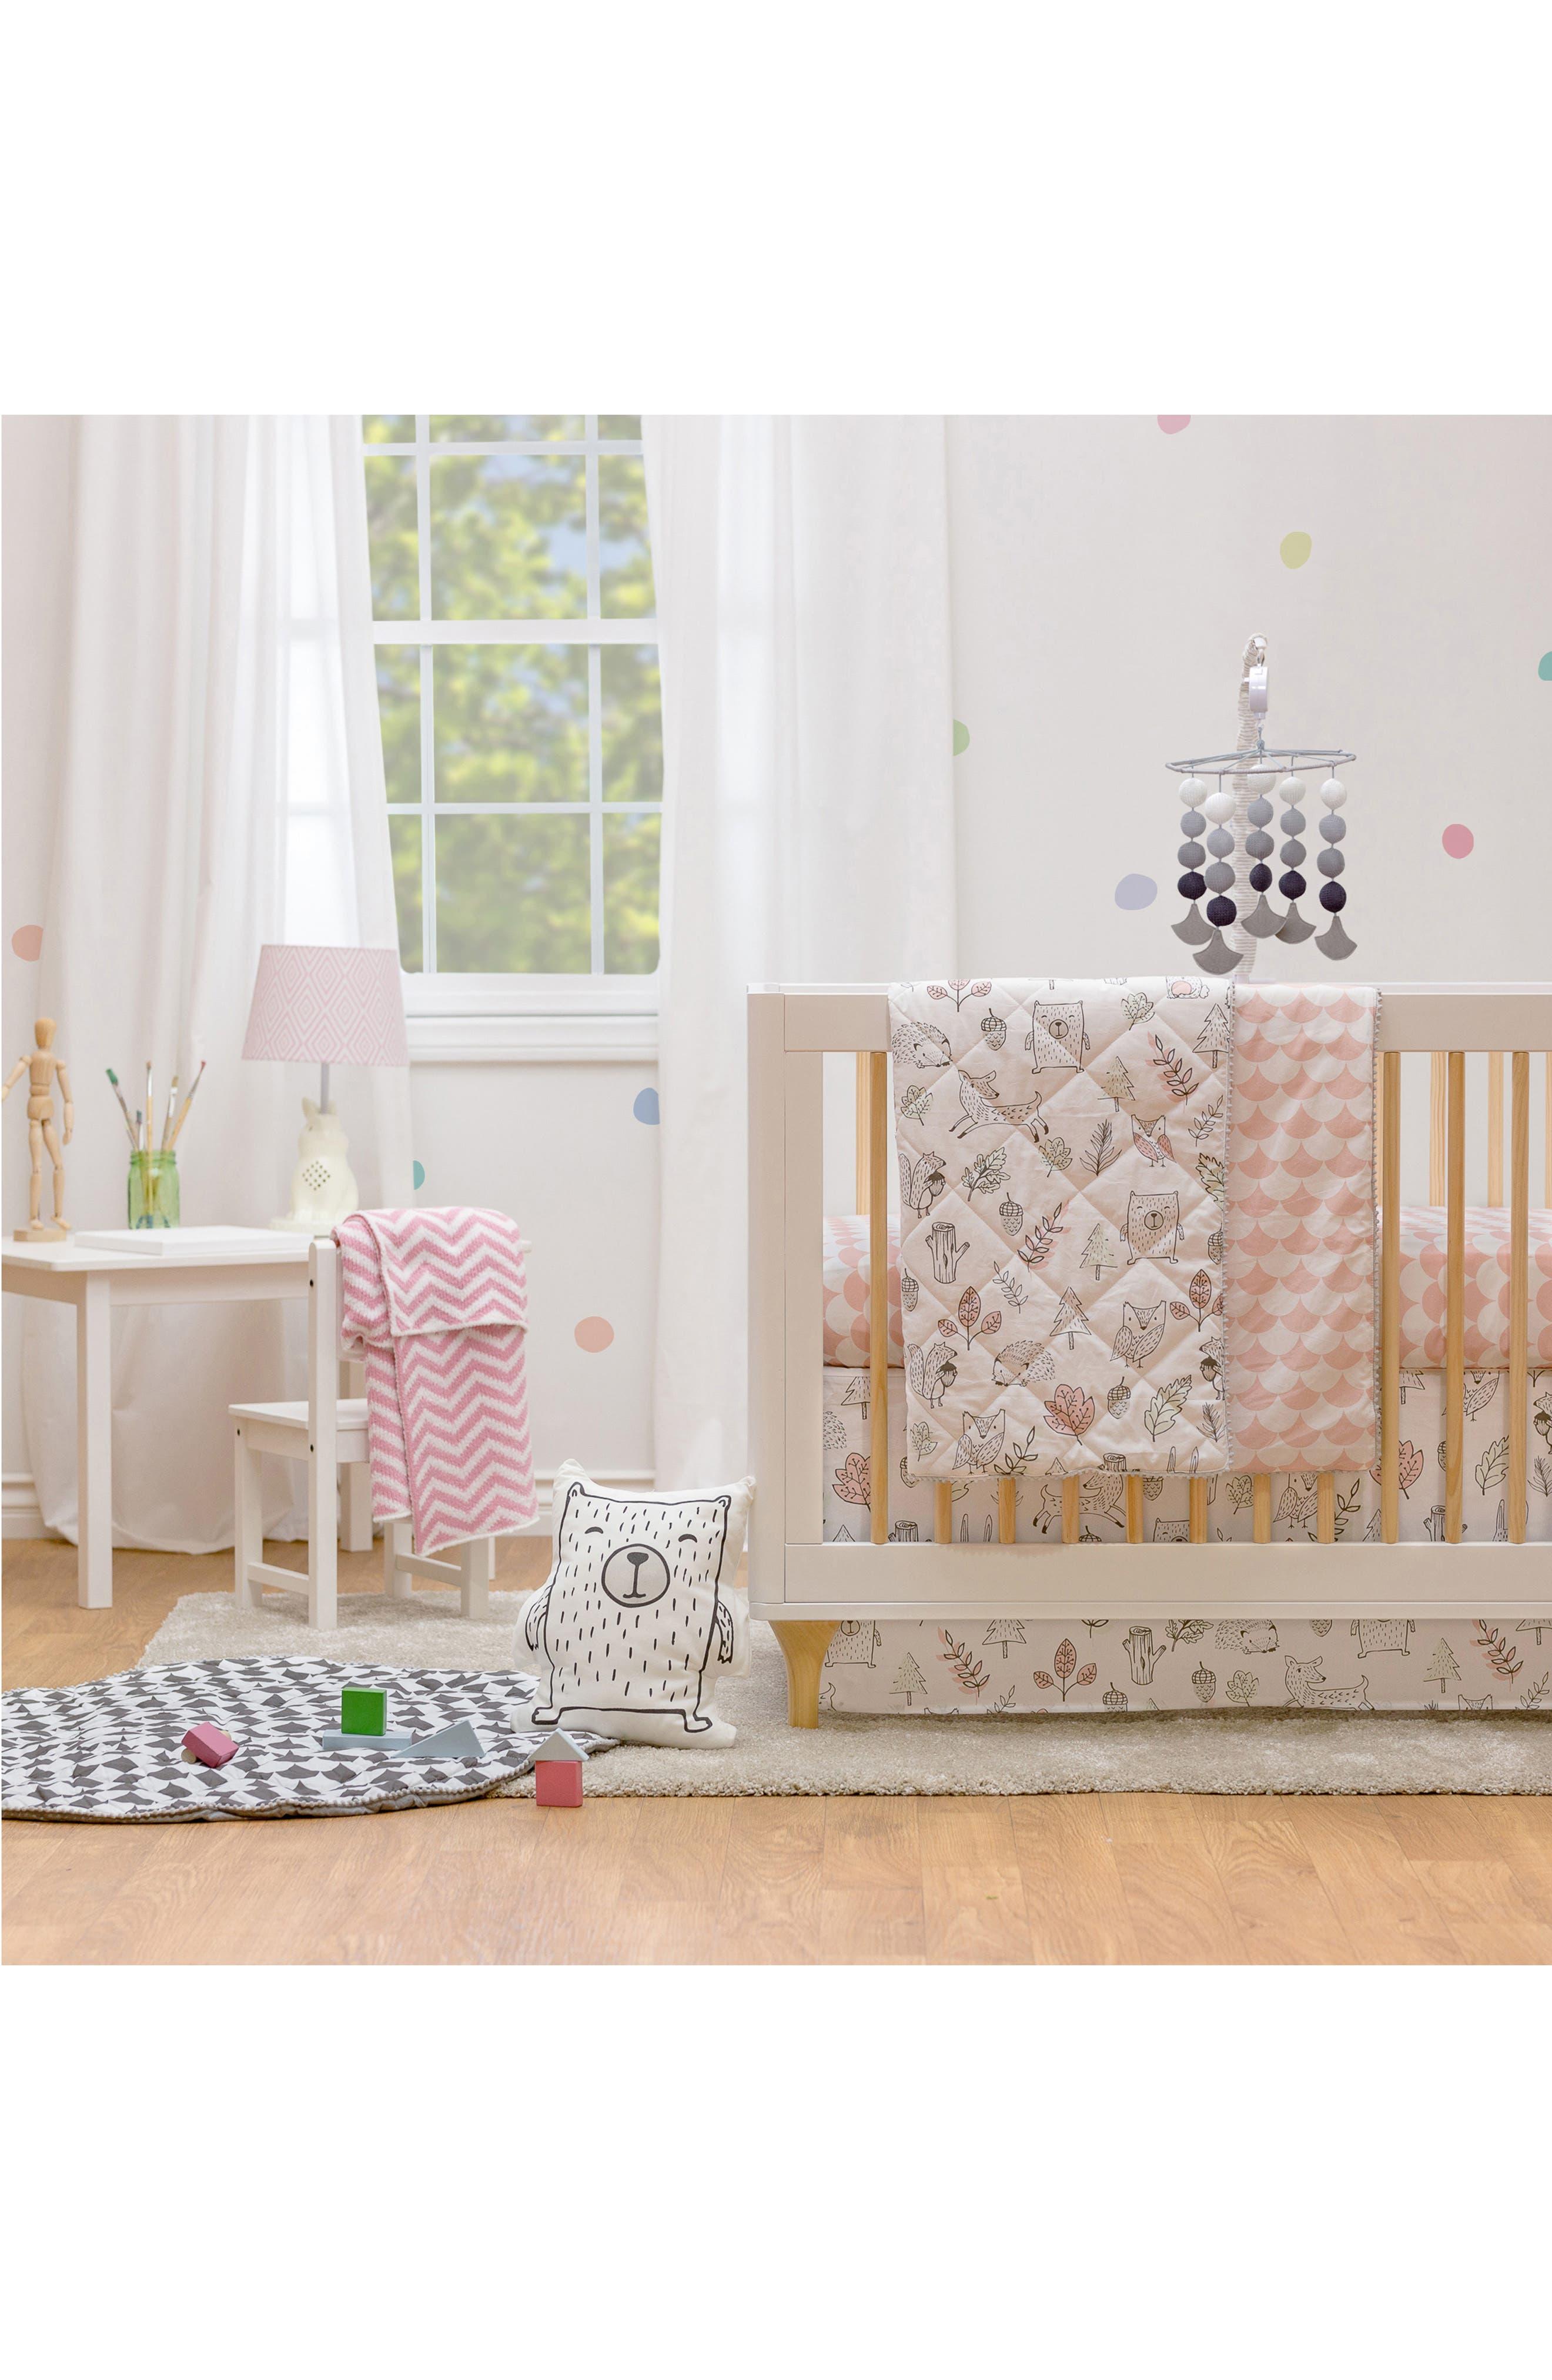 Woodlands 4-Piece Crib Bedding Set,                             Alternate thumbnail 8, color,                             KAYDEN - WOODLANDS